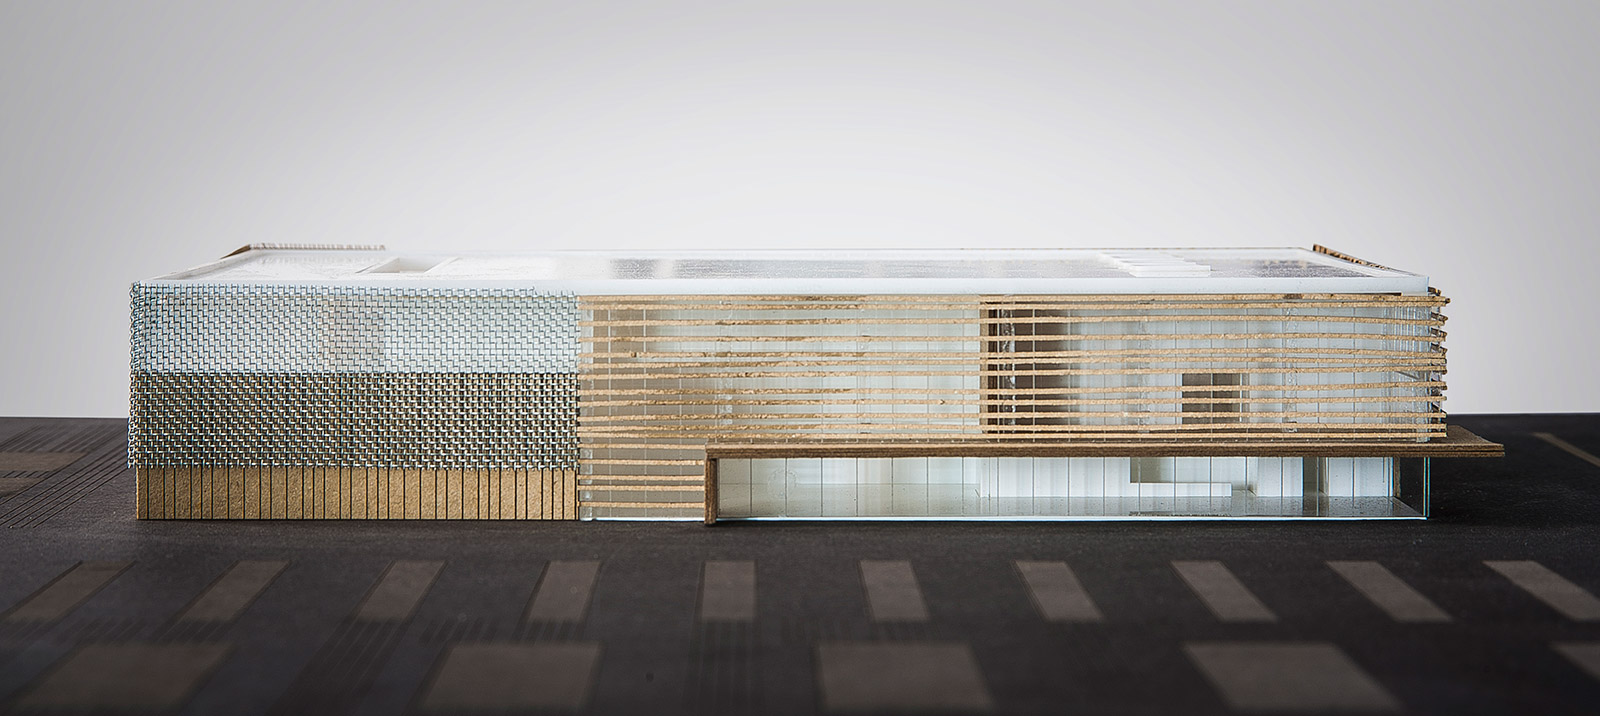 maqueta-arquitectura-architecture-model-tfg-etsav-upv-centro-de-produccion-musical-arquimaqueta-valencia-1